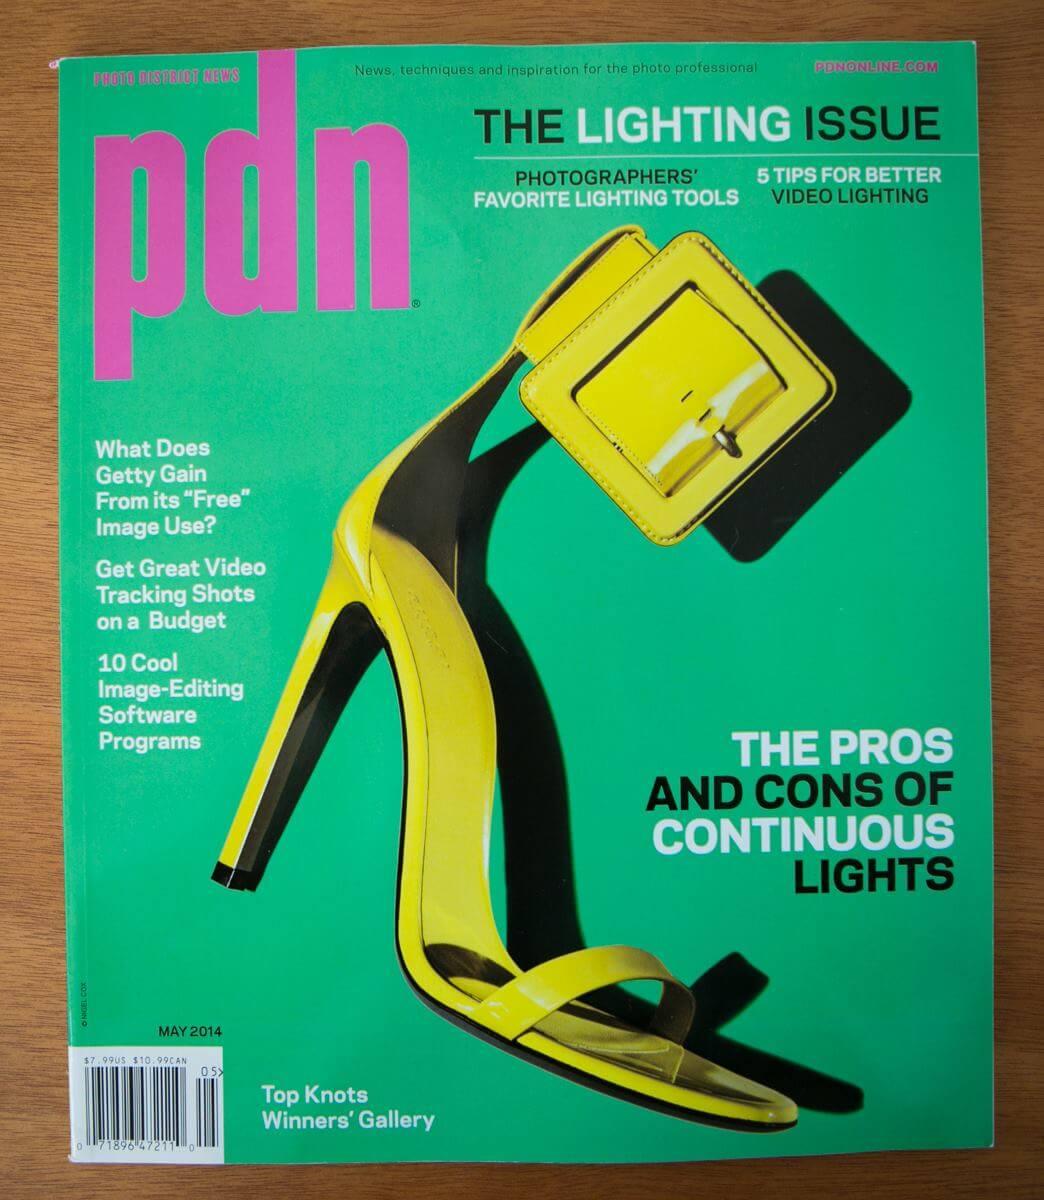 FOTOVOLIDA_PDNTopKnots_COVER_2014_MW_3715